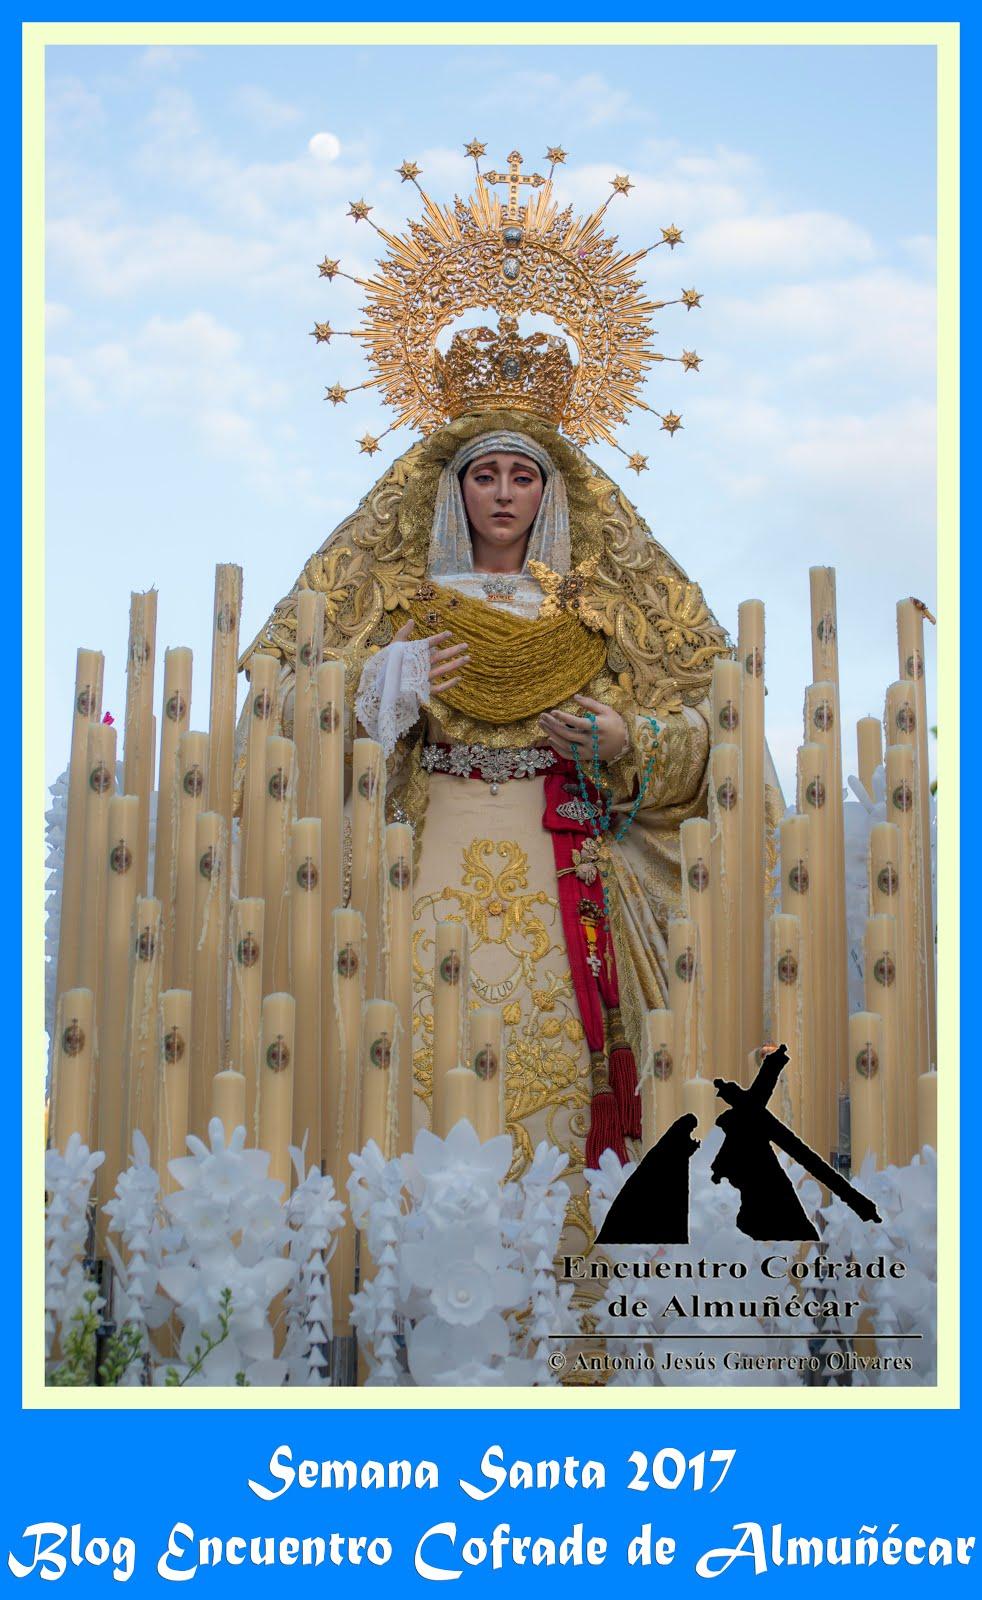 Cartel Anunciador de Semana Santa 2017 de este Blog